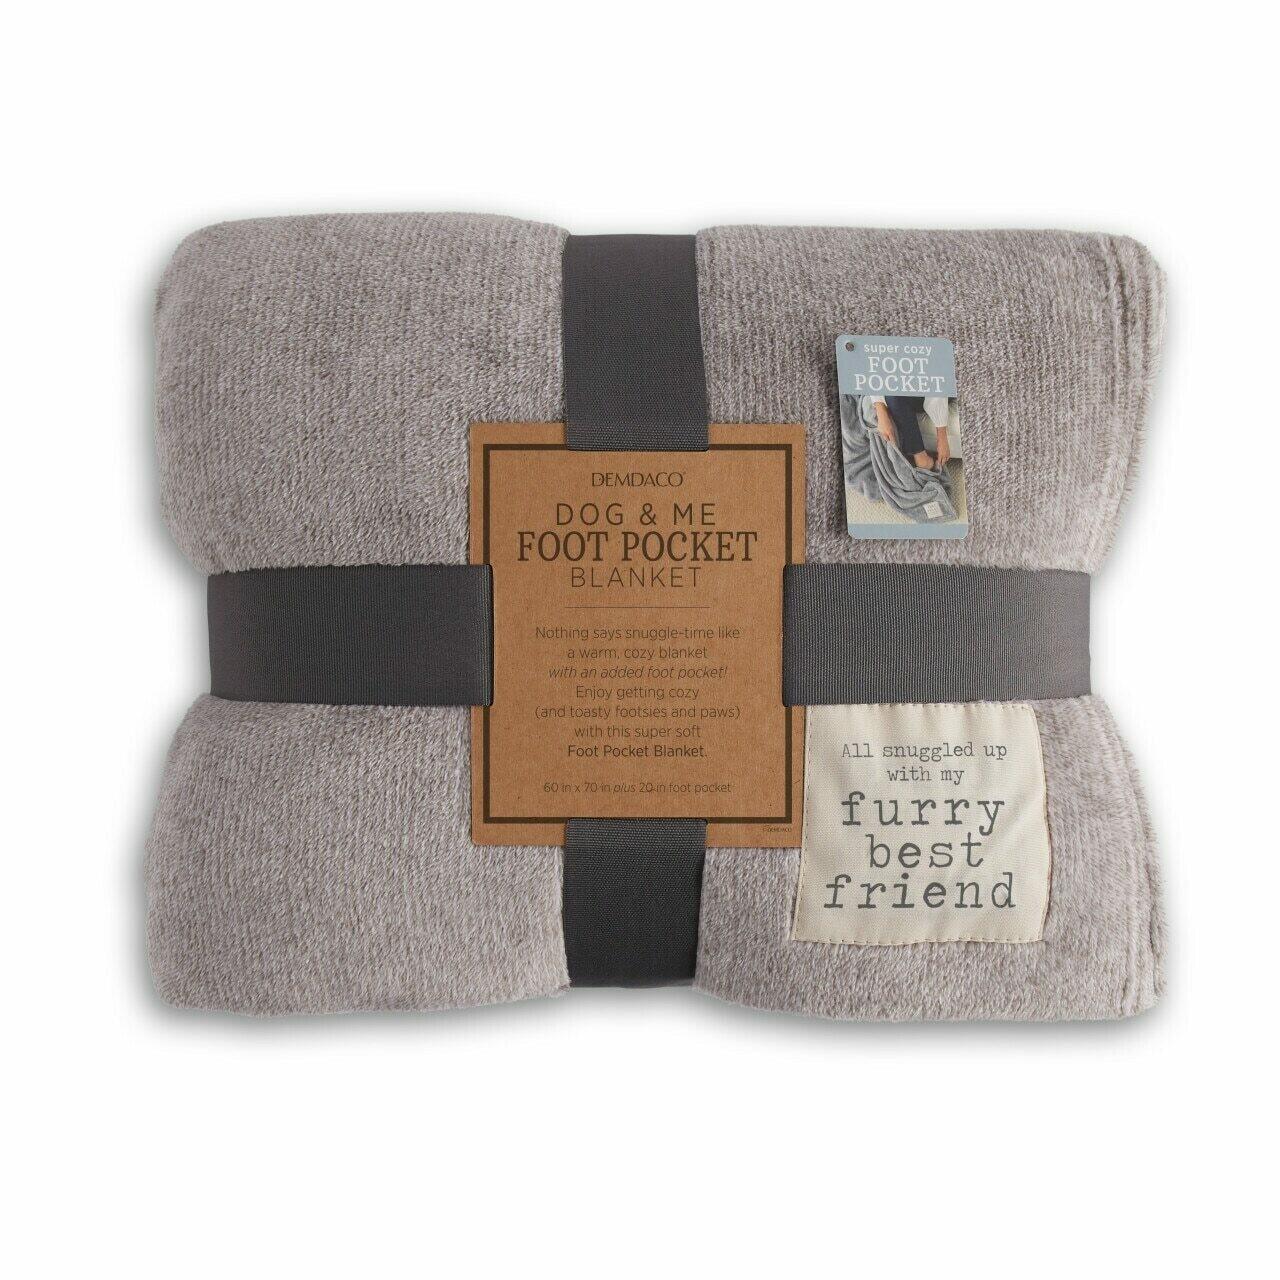 Demdaco Dog & Me Foot Pocket Blanket TAUPE